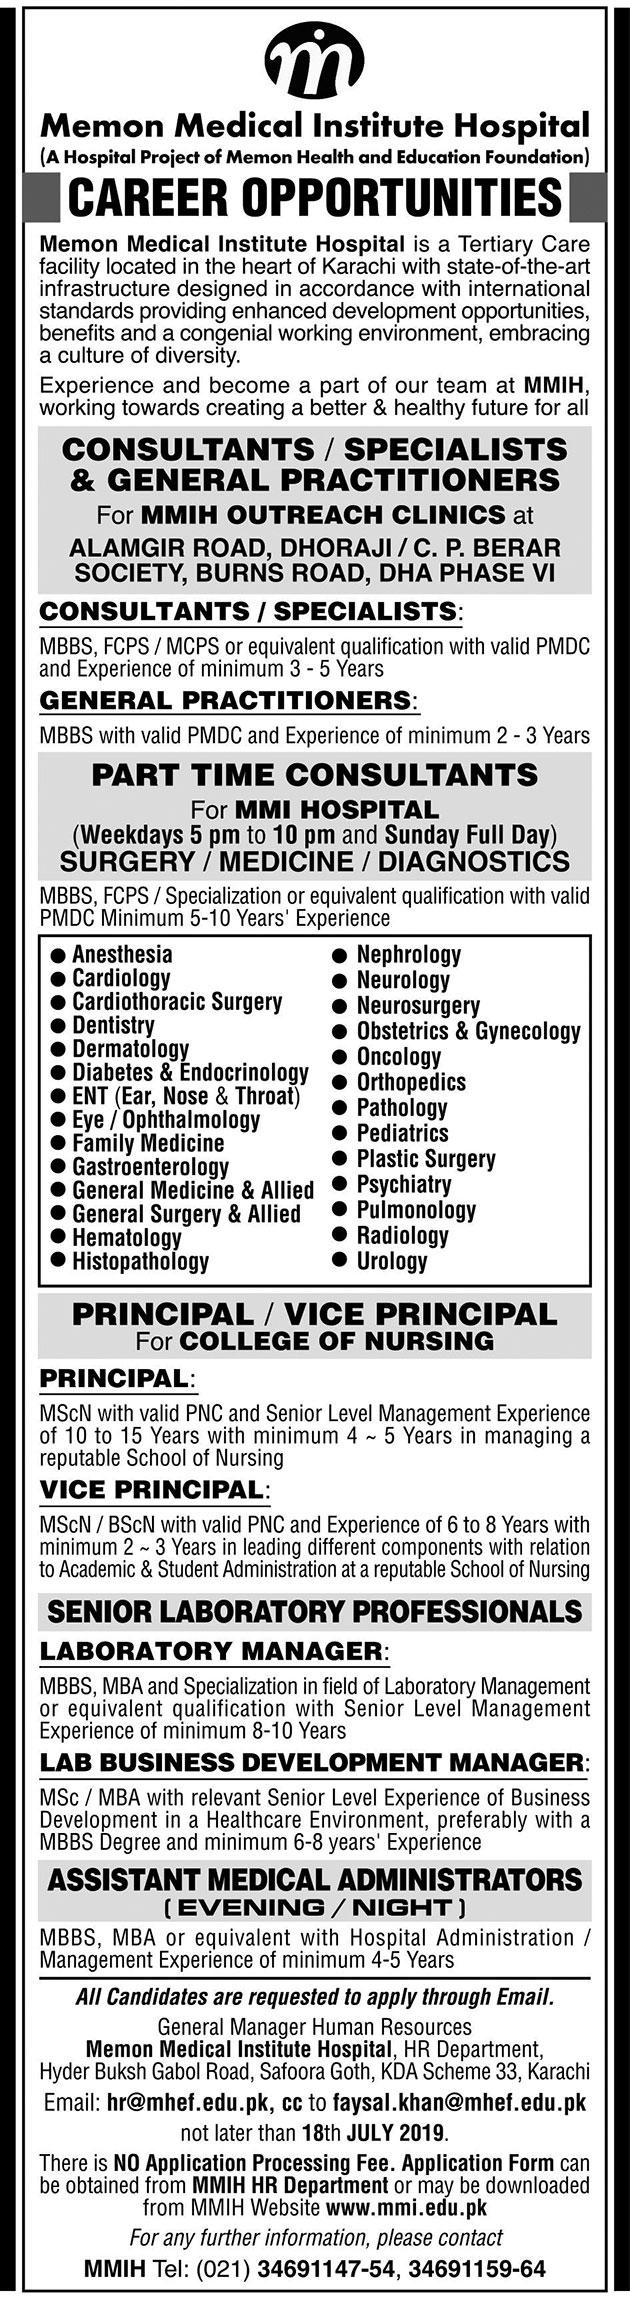 Pharmacist jobs in karachi 2019